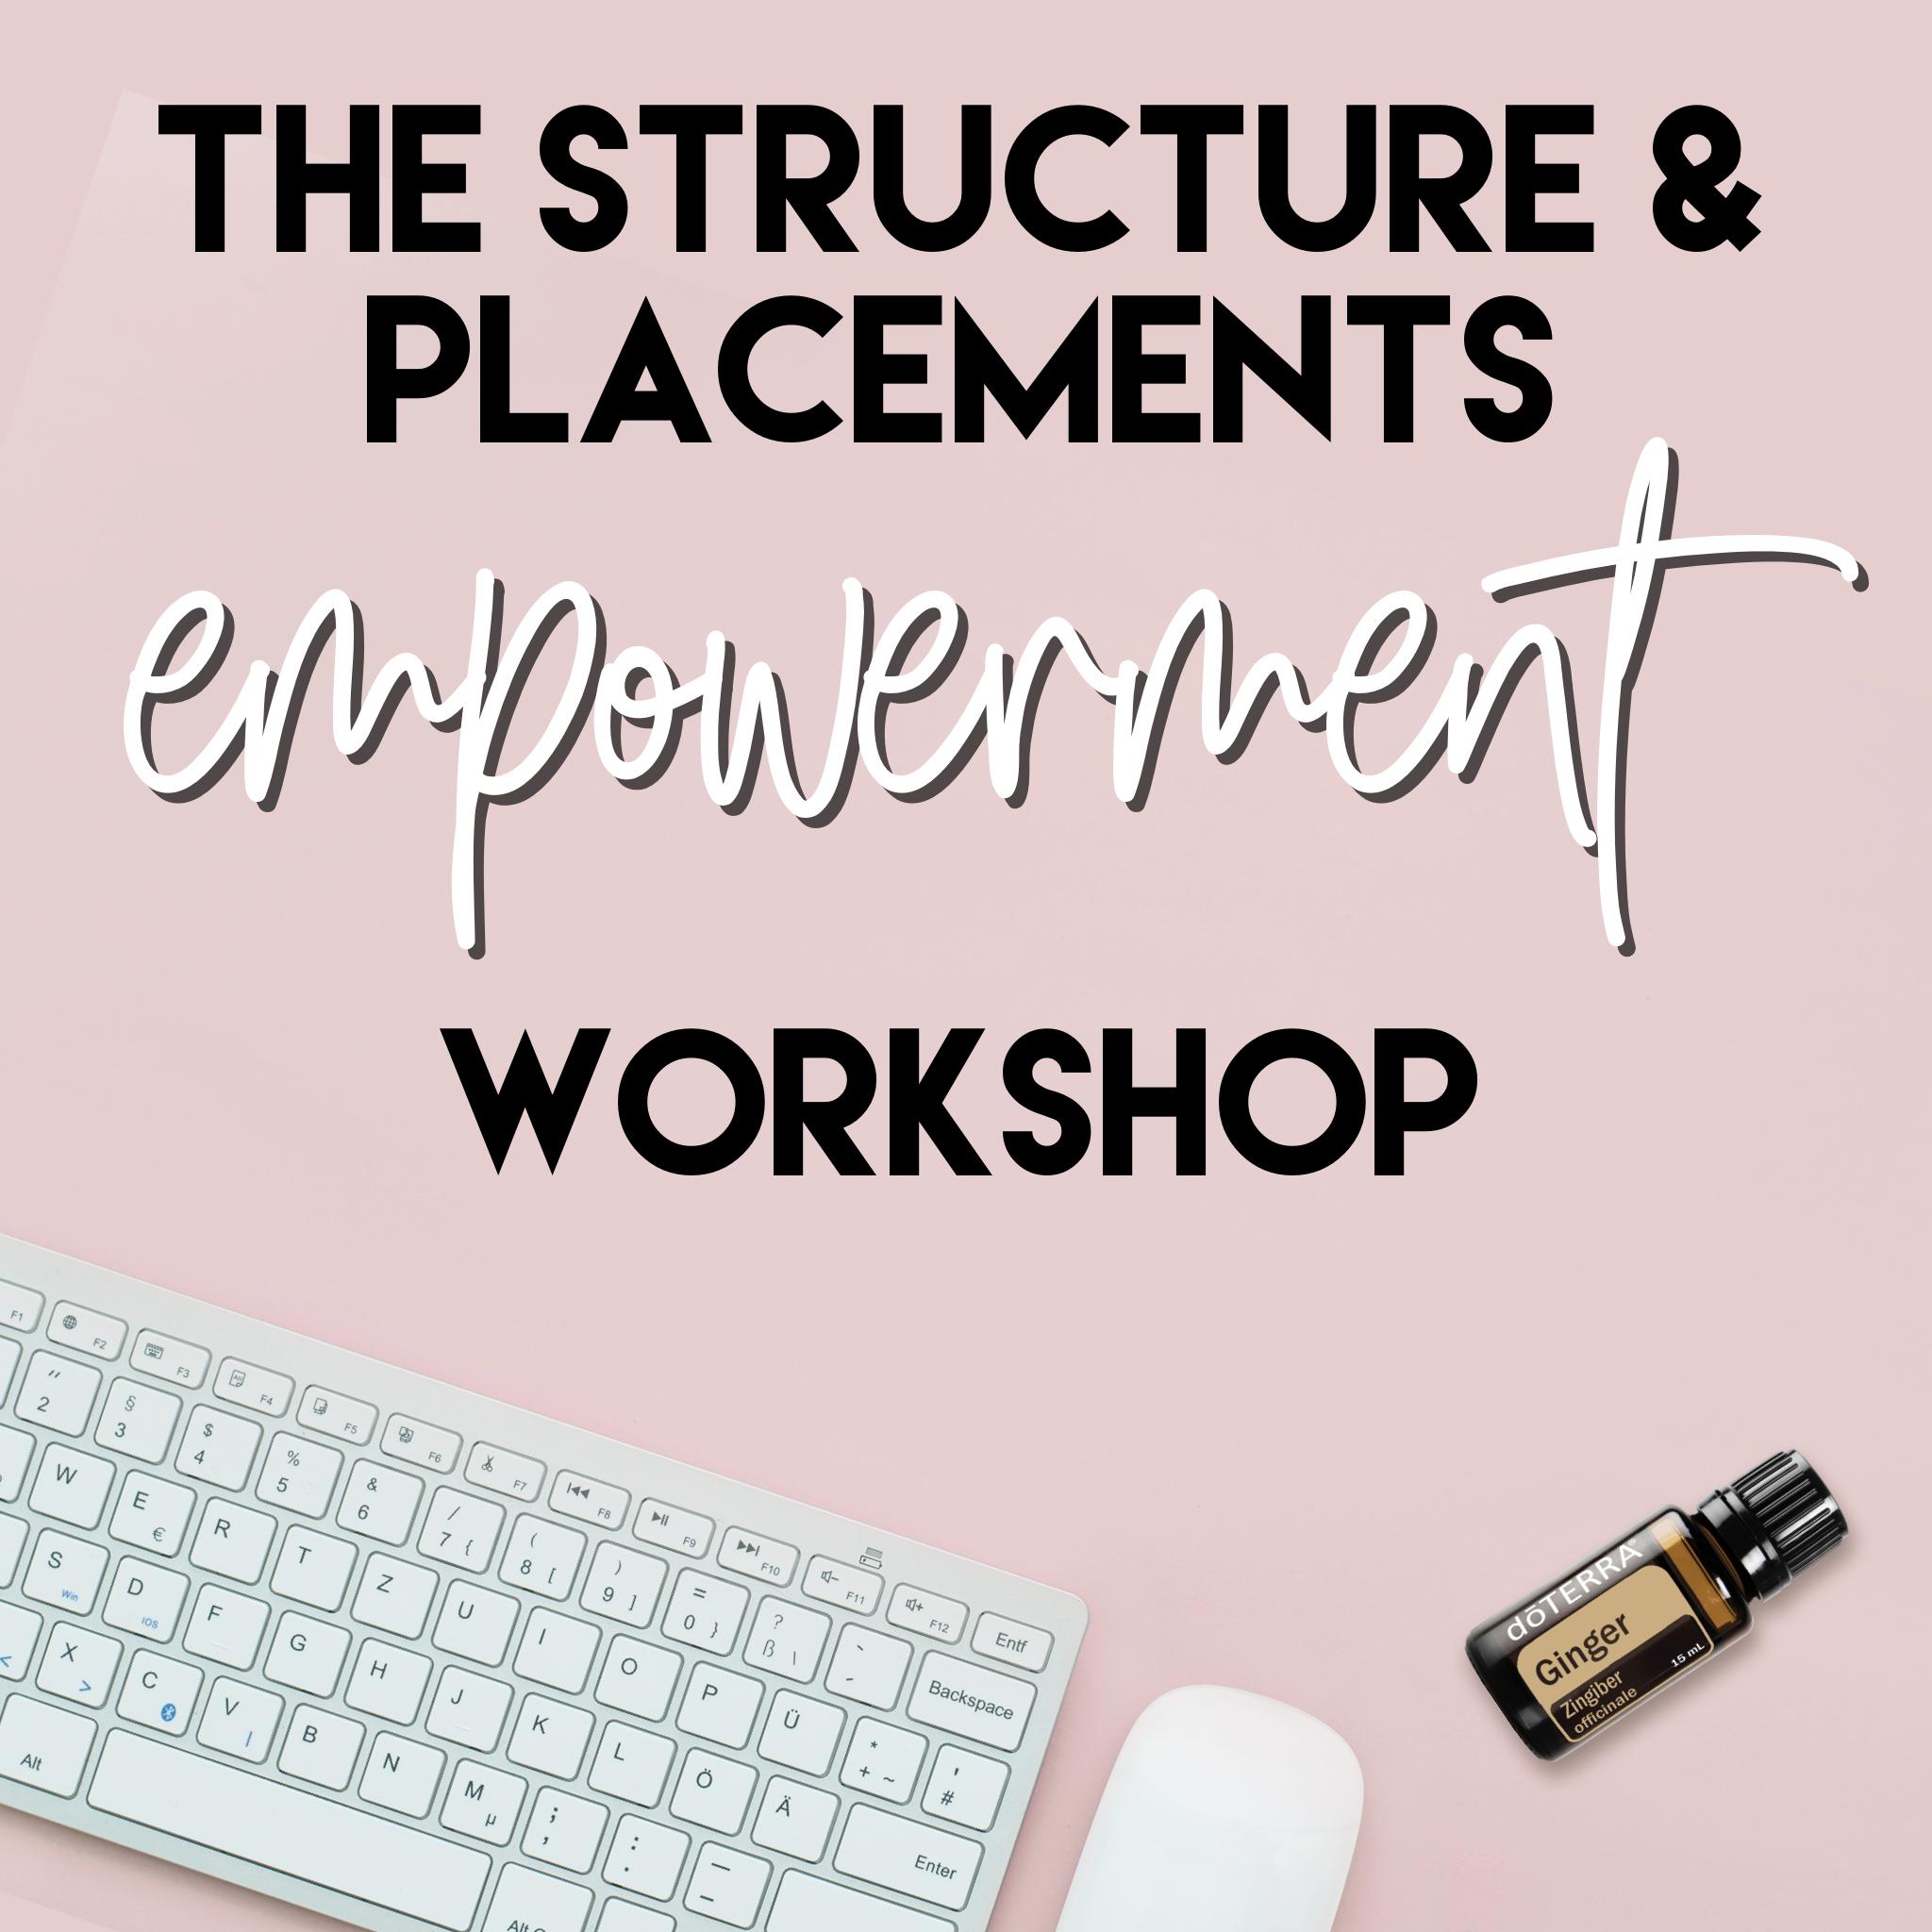 Structure & Placements Course